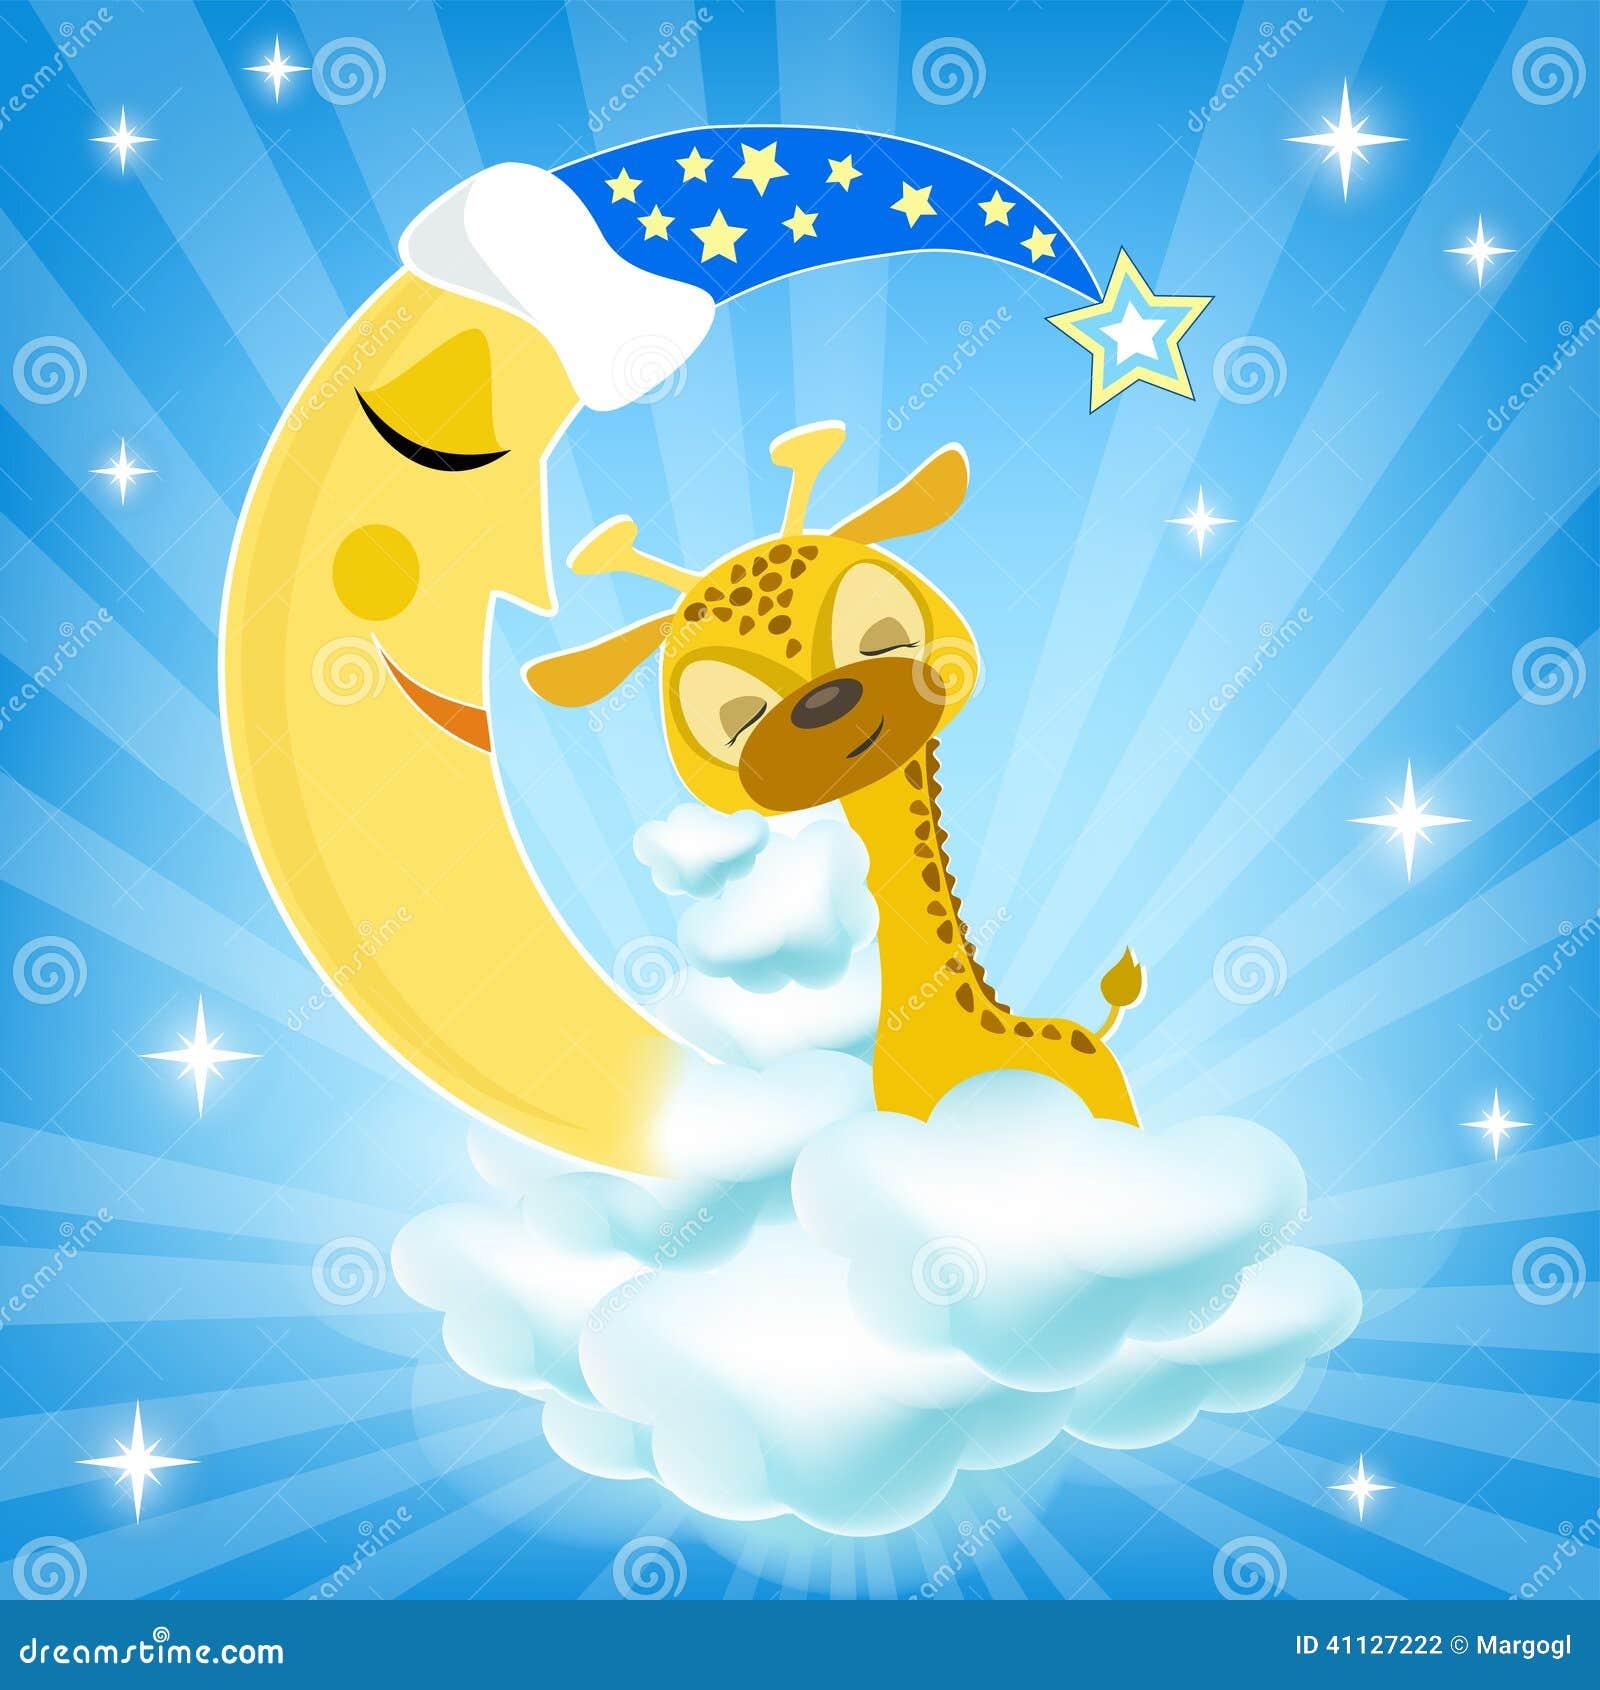 baby giraffe sleeping on the cloud stock vector image